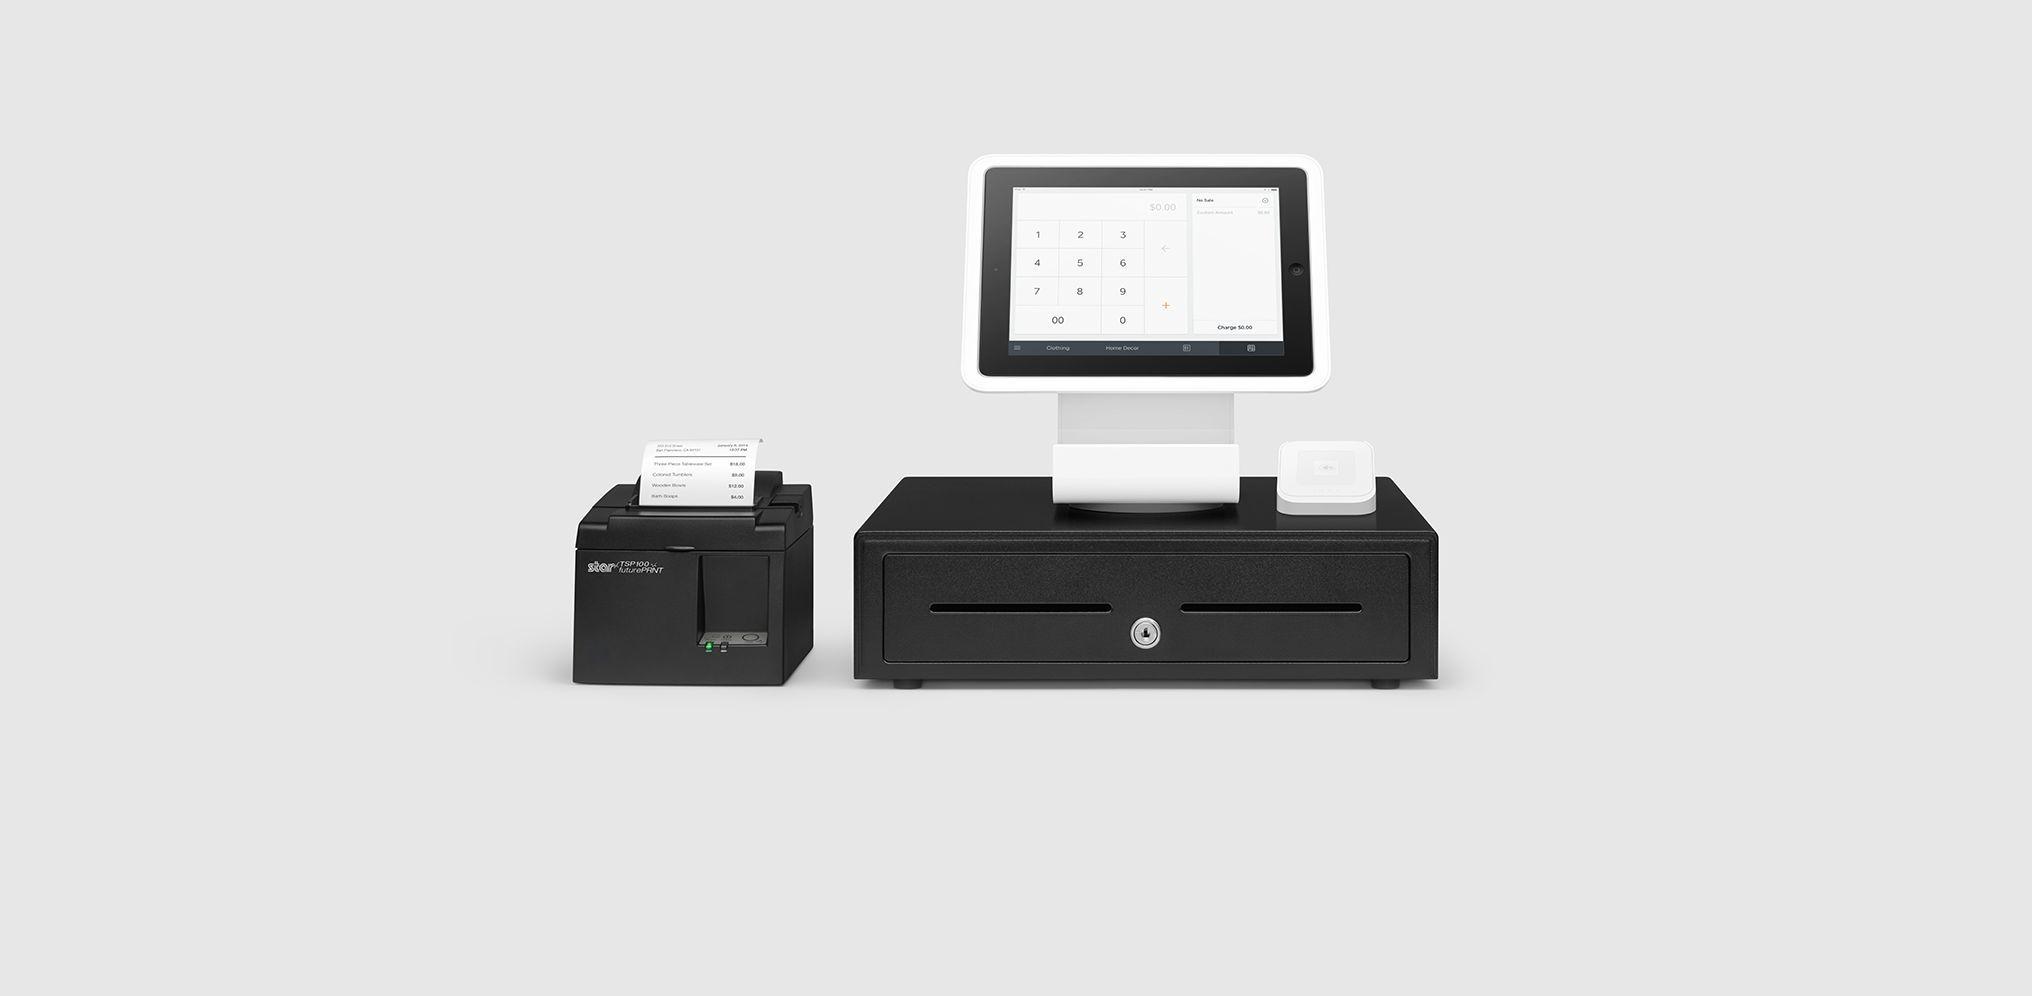 Square Stand Kit For Ipad 2017 Ipad Pro 9 7 Quot Ipad Air